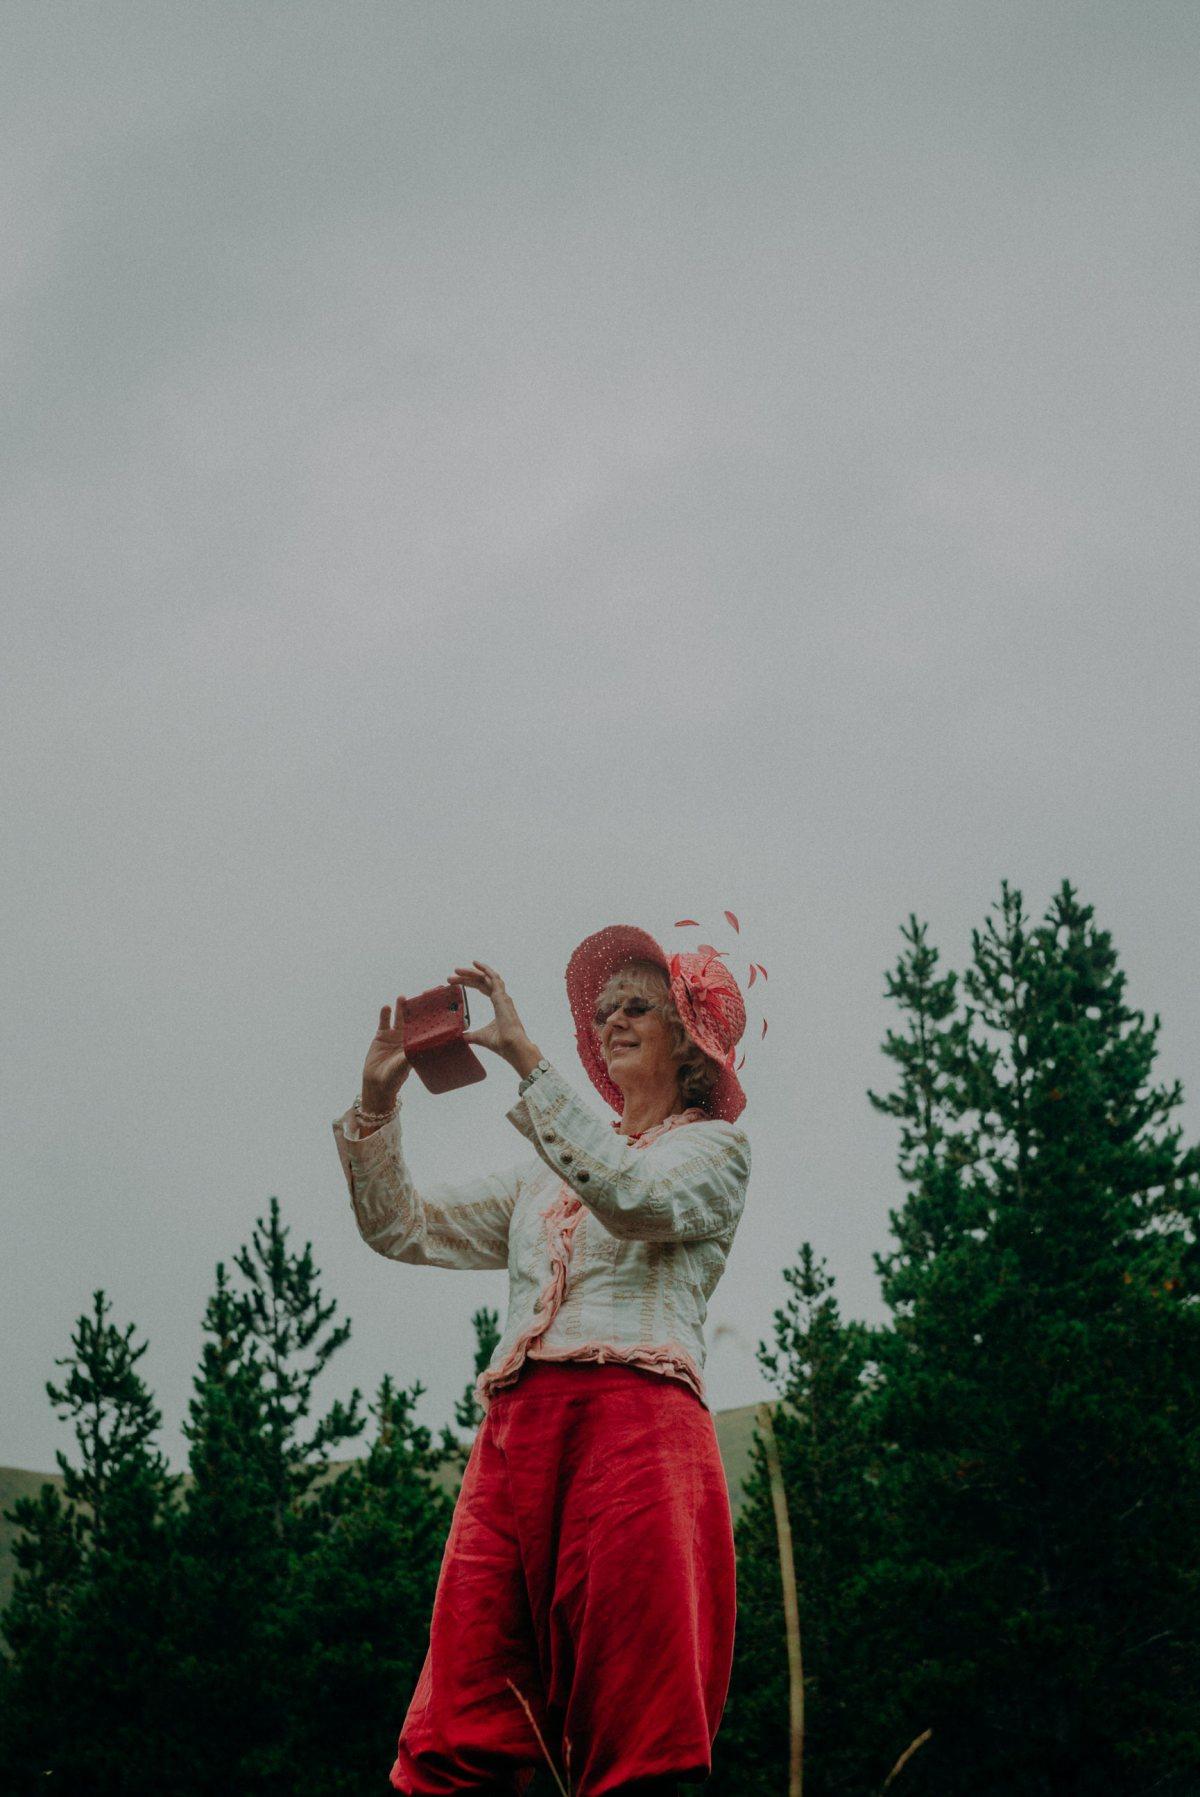 wedding-photographer-scotland-glen-clova-29